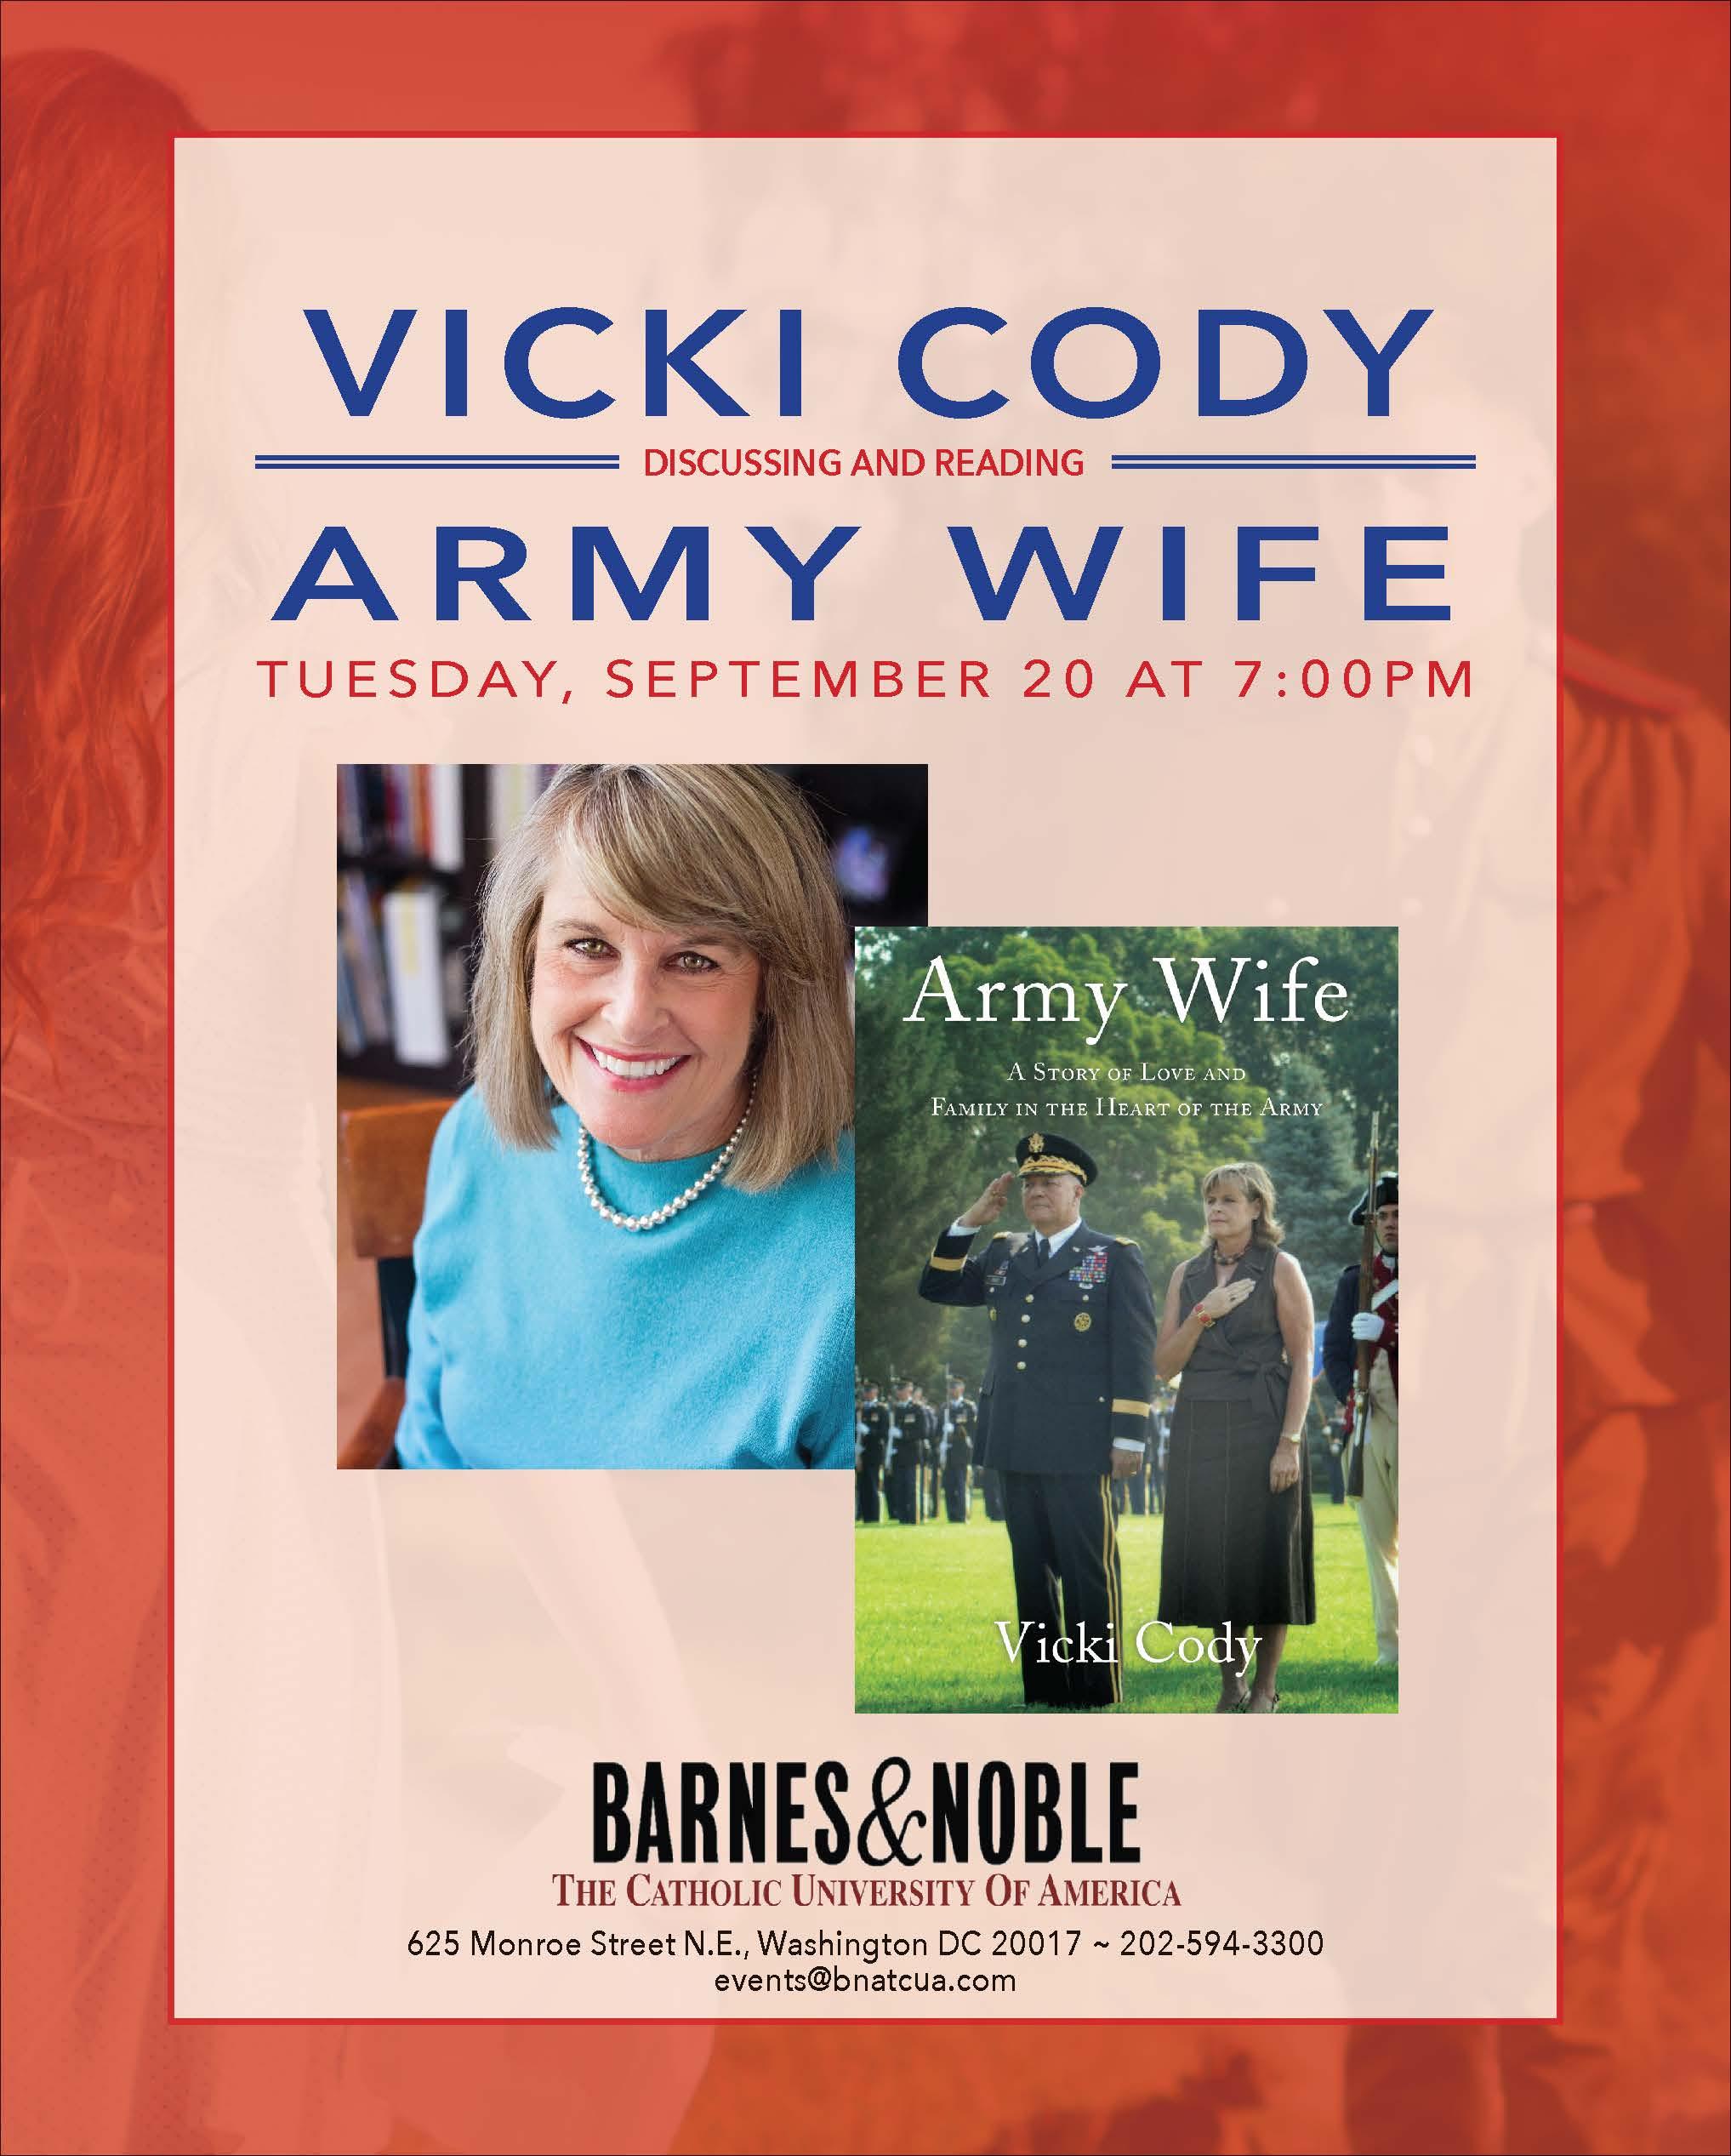 Barnes & Noble:  Army Wife by Vicki Cody